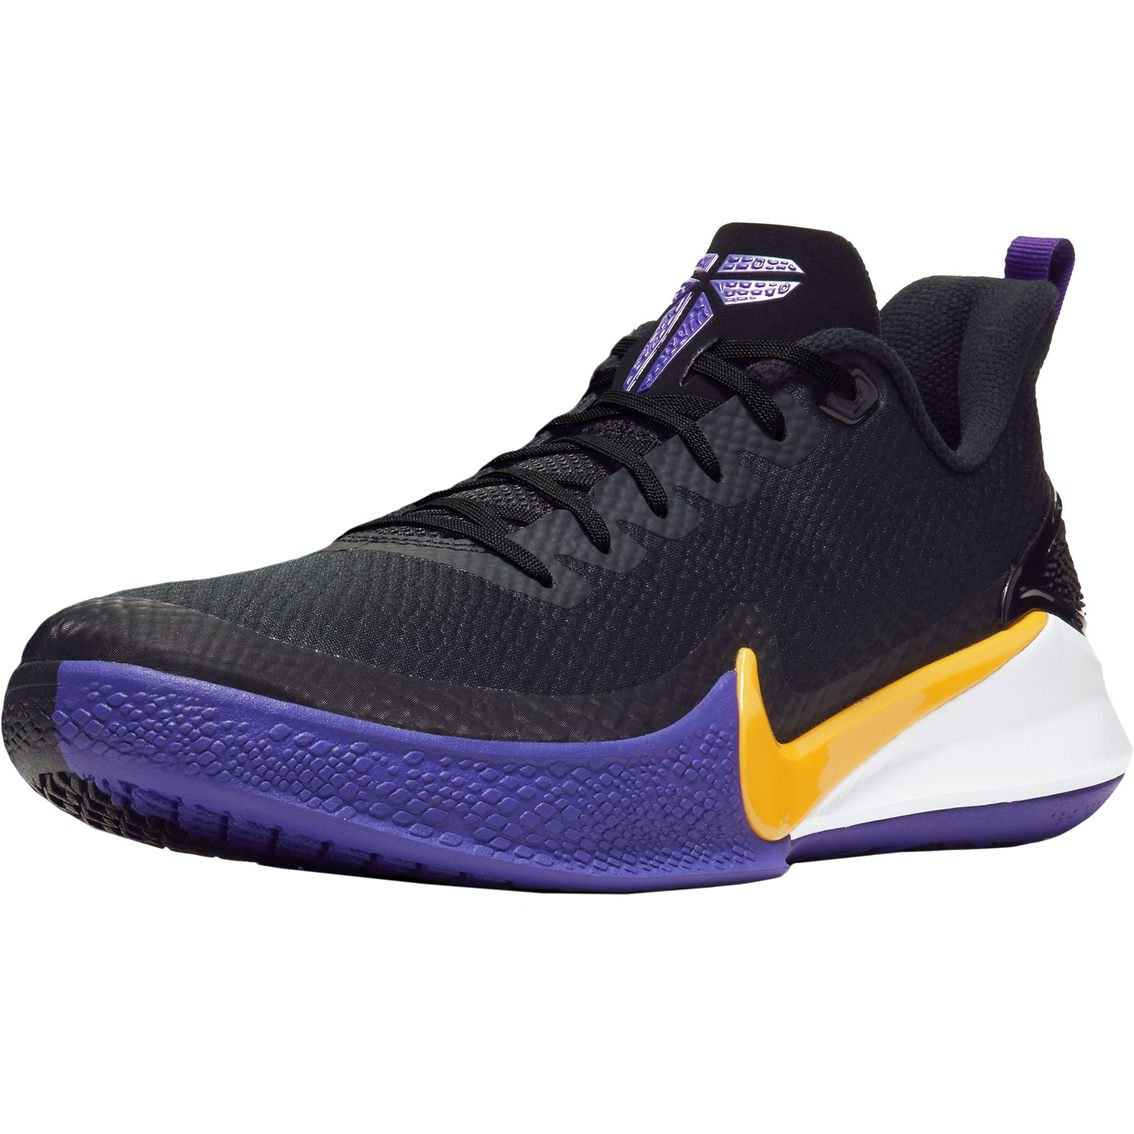 Nike Men's Mamba Focus Court Shoes